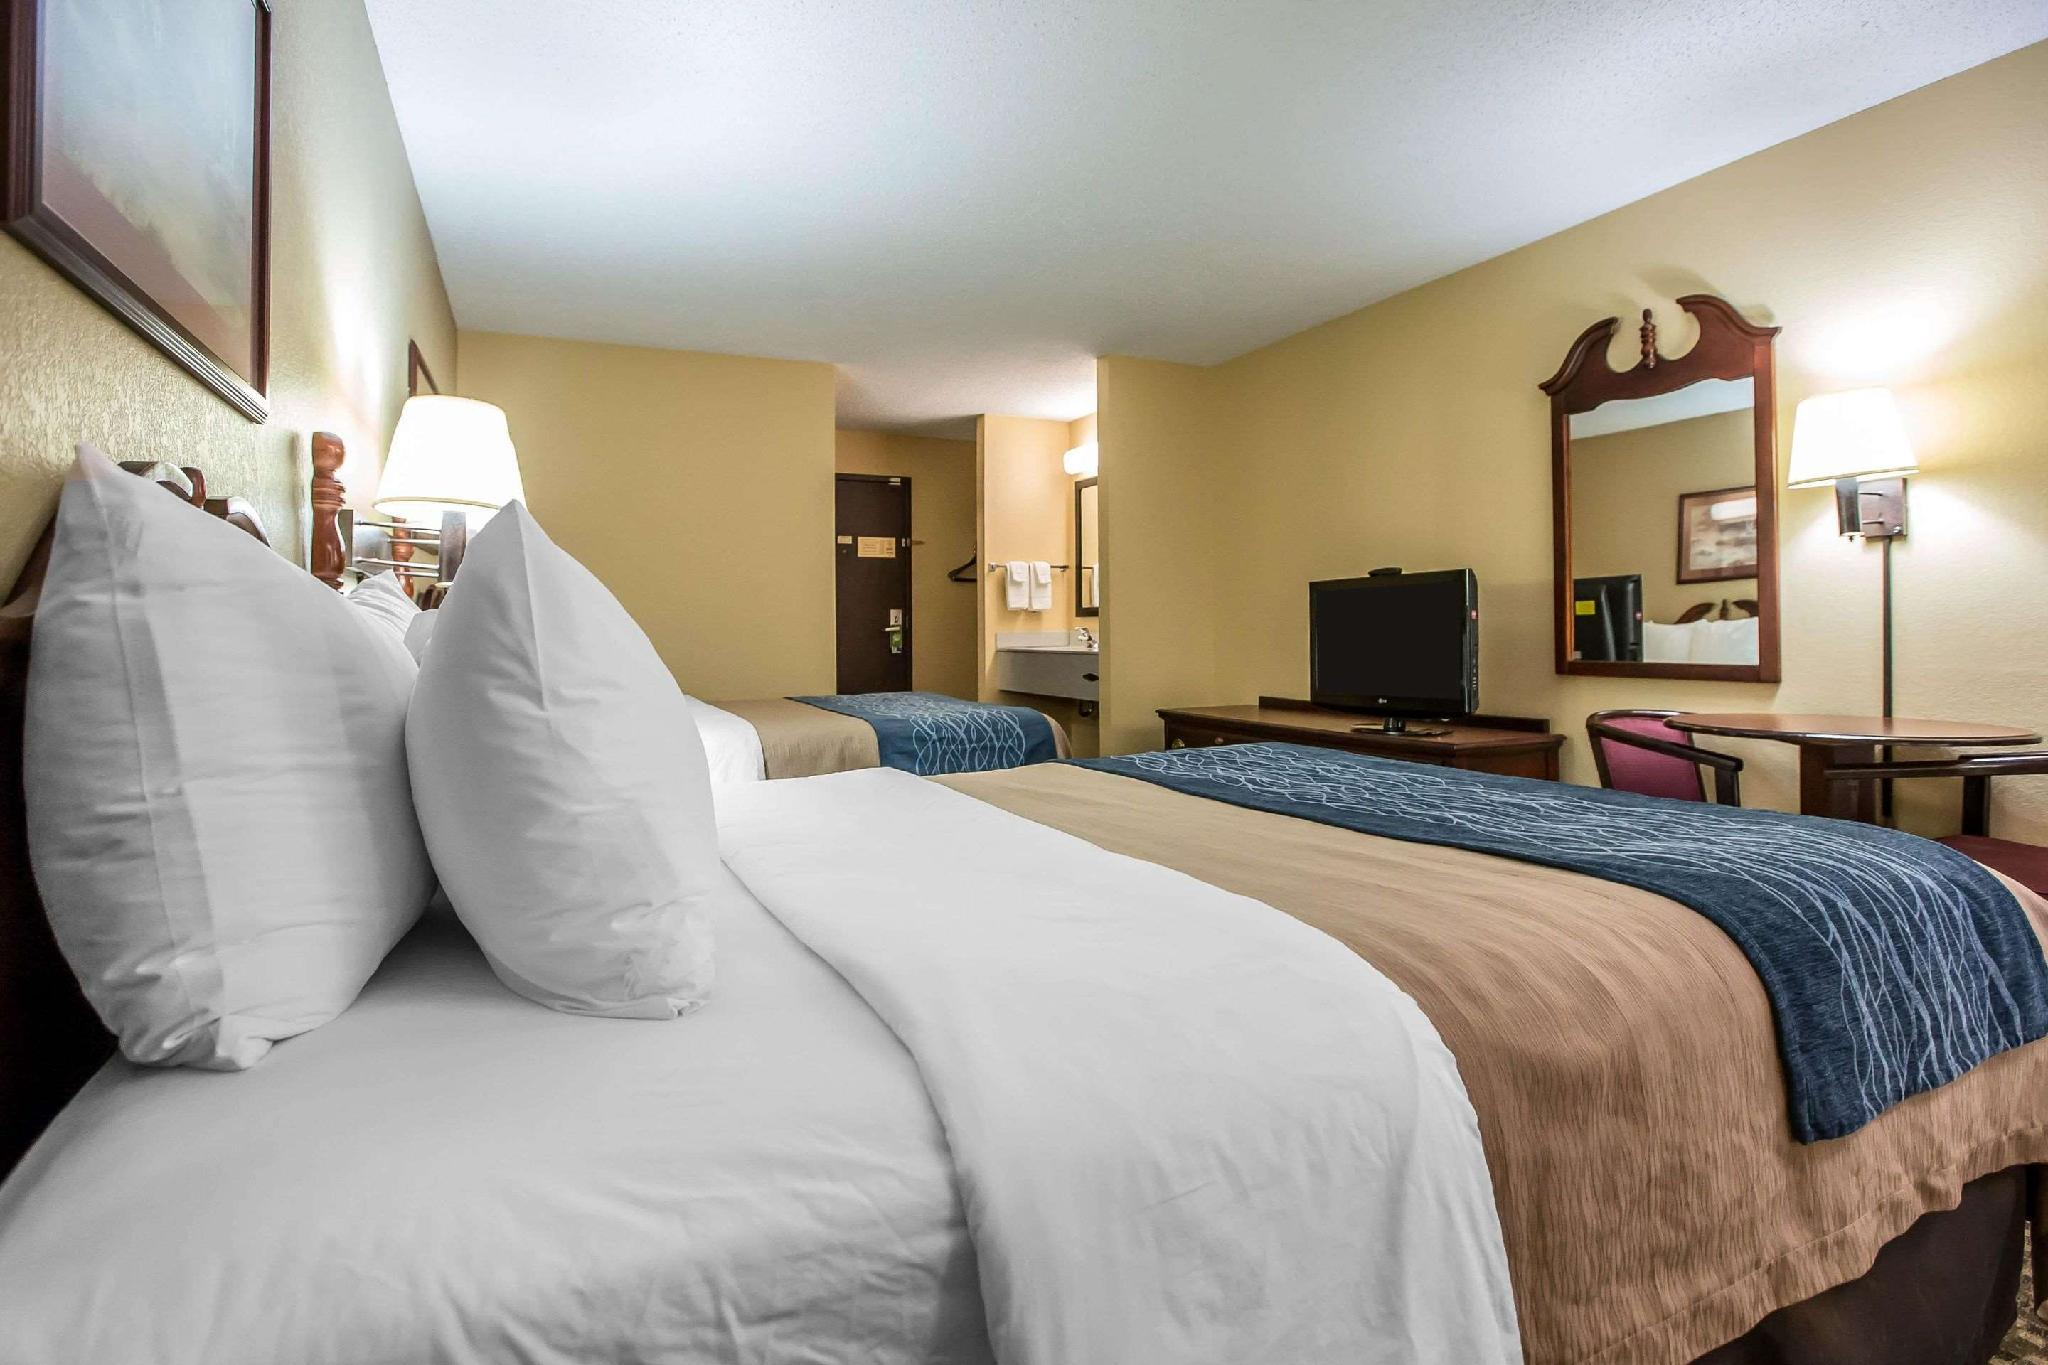 Quality Inn & Suites, La Salle